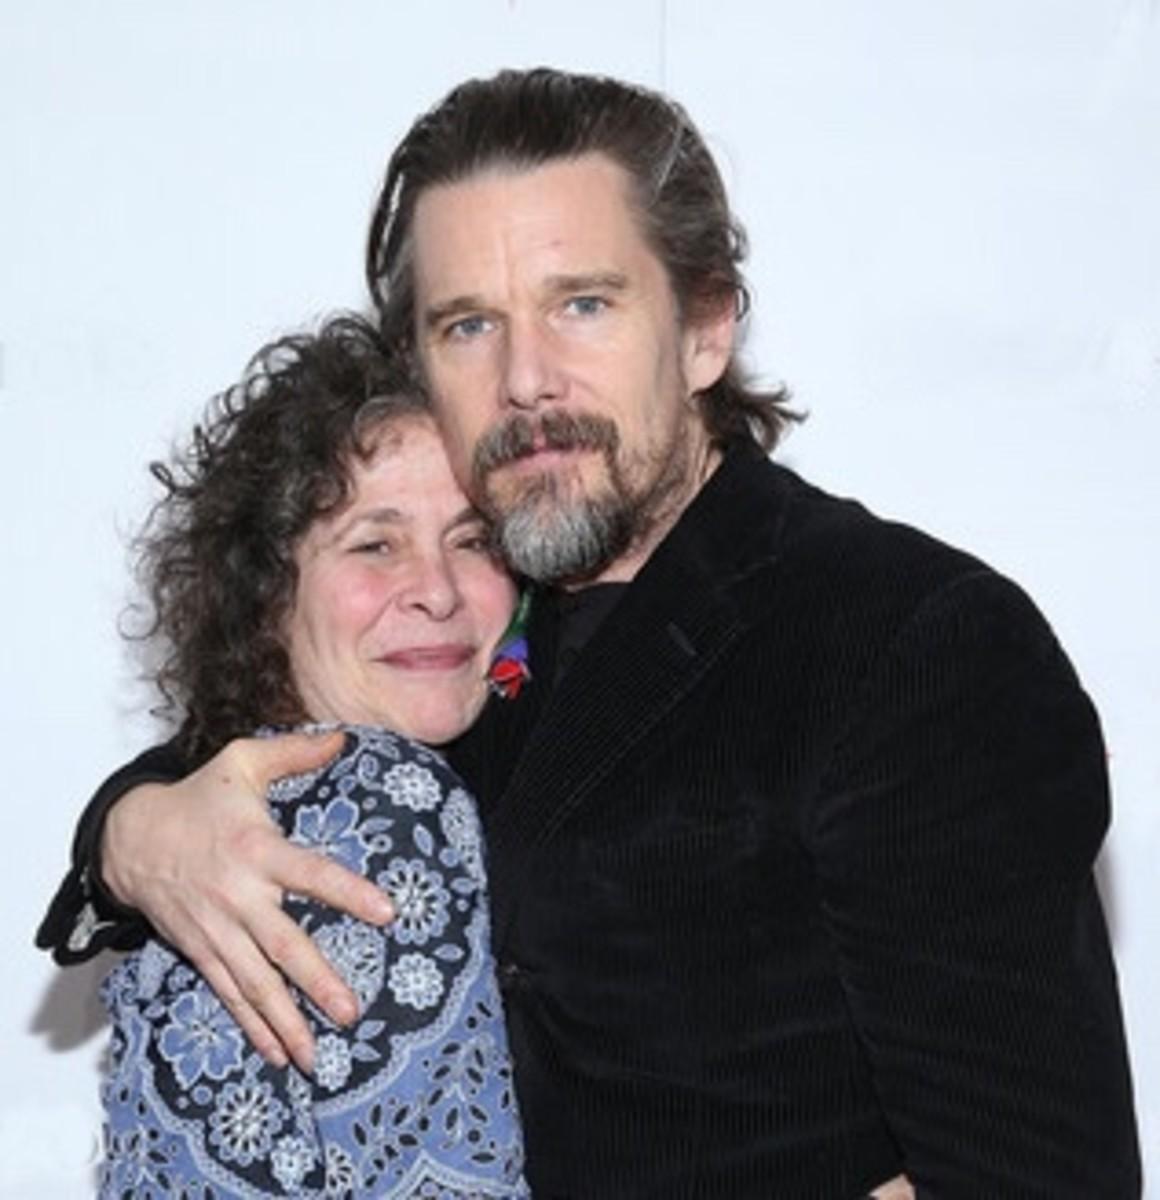 Sybil Rosen and Ethan Hawke